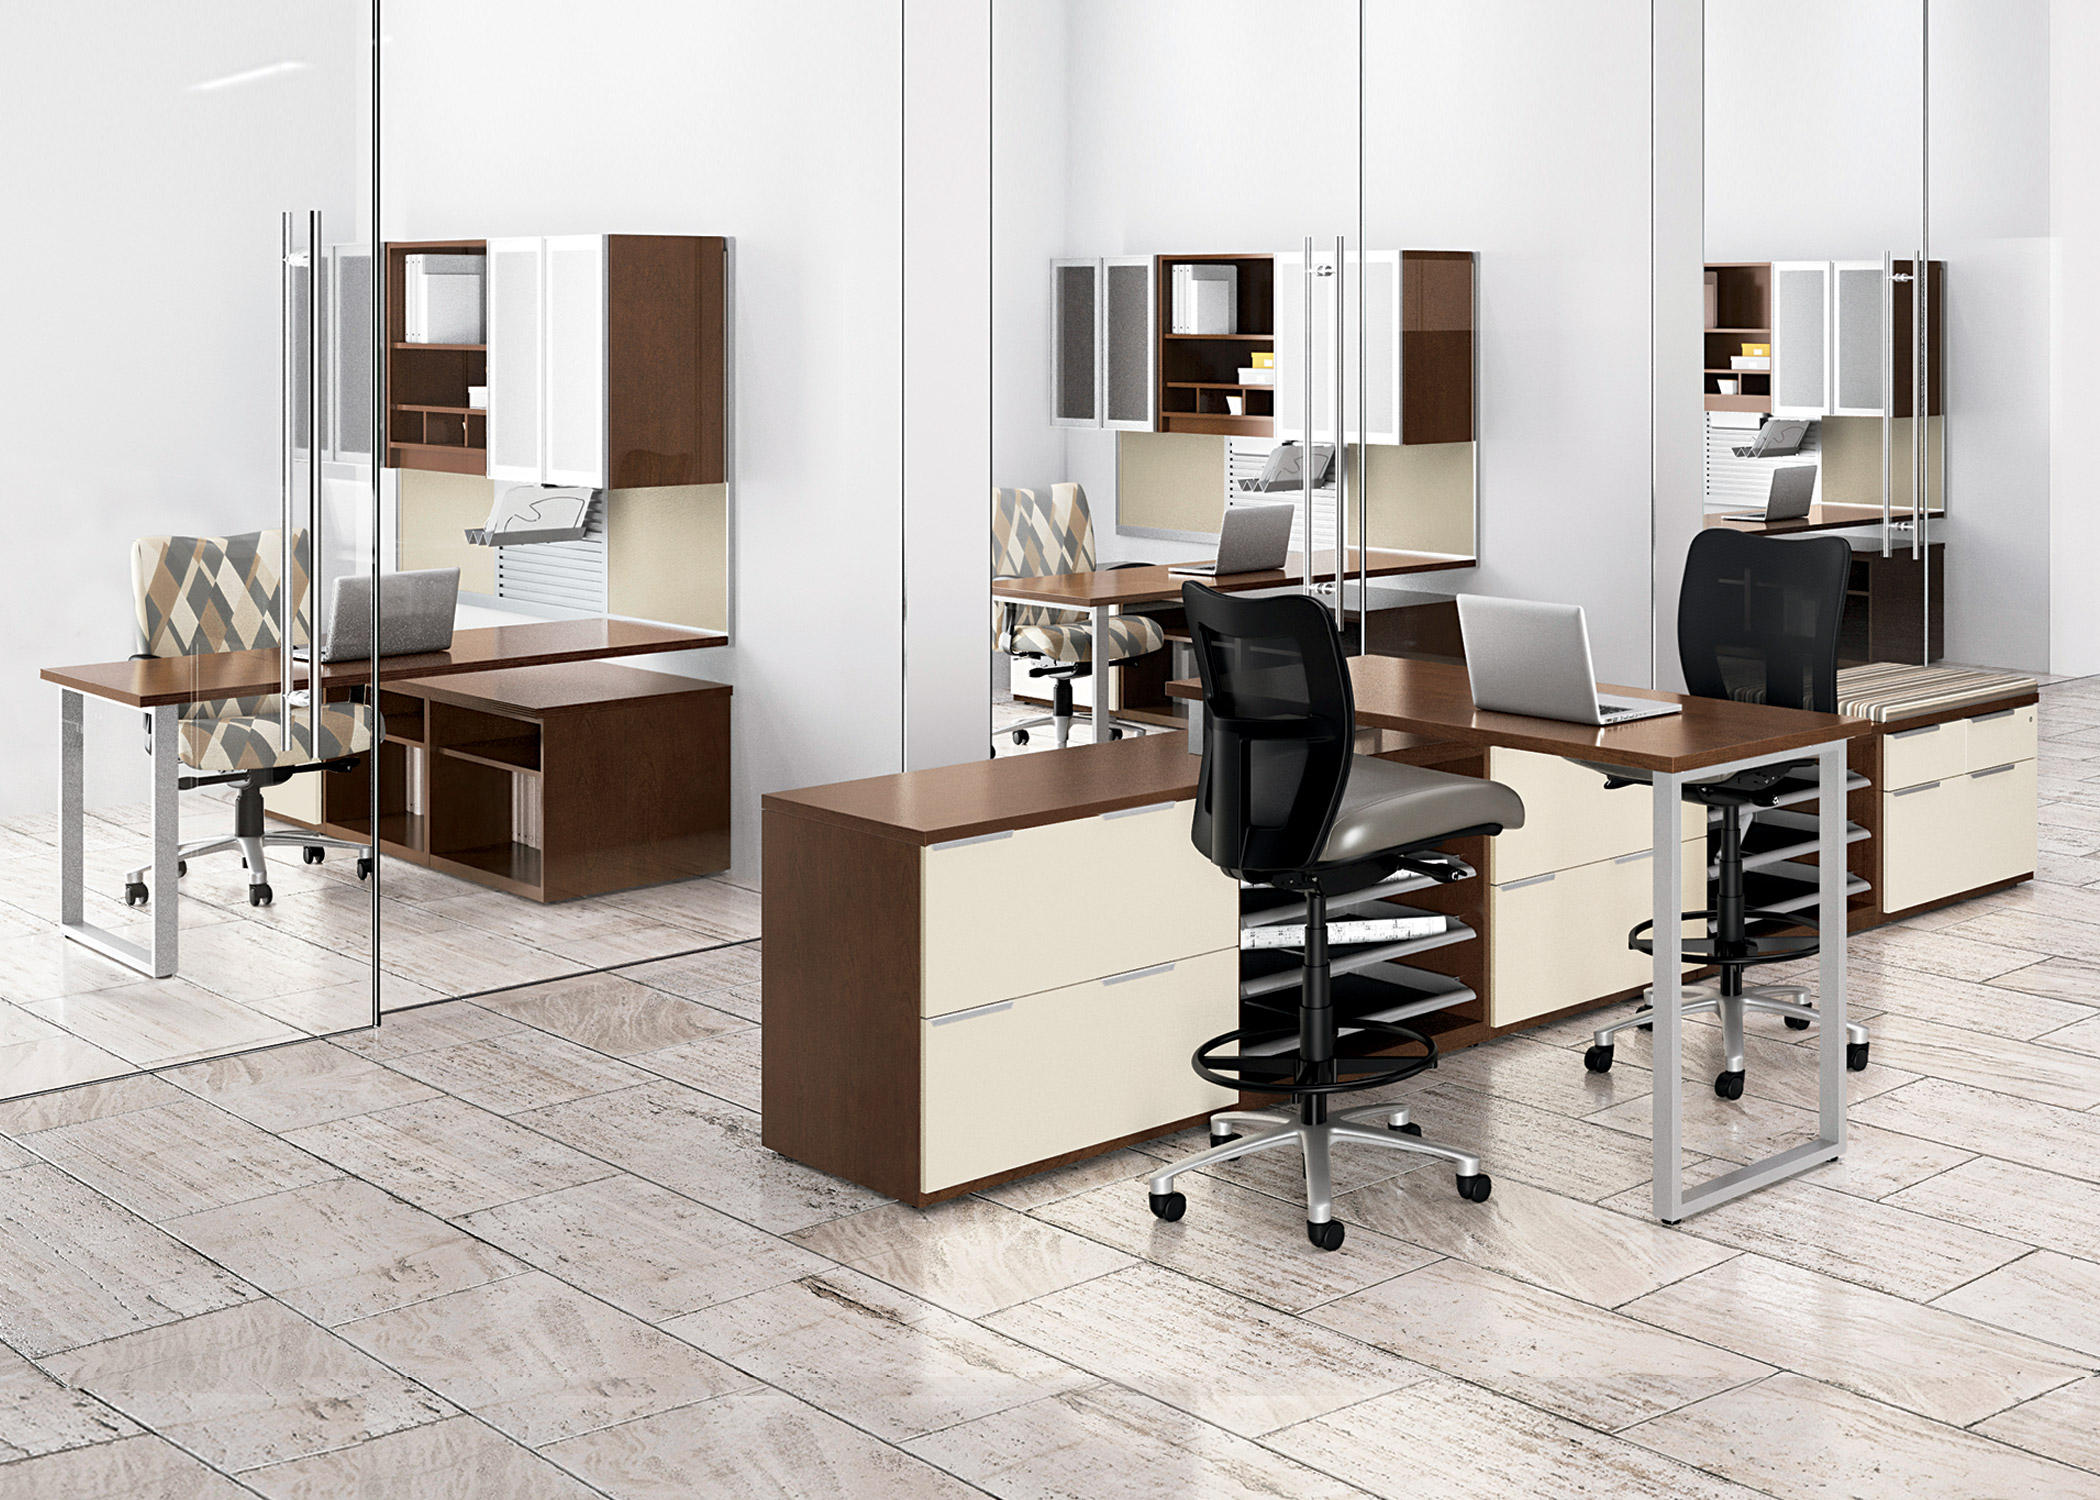 National Office Furniture Jasper In National Office Furniture Headquarters By Gensler Jasper